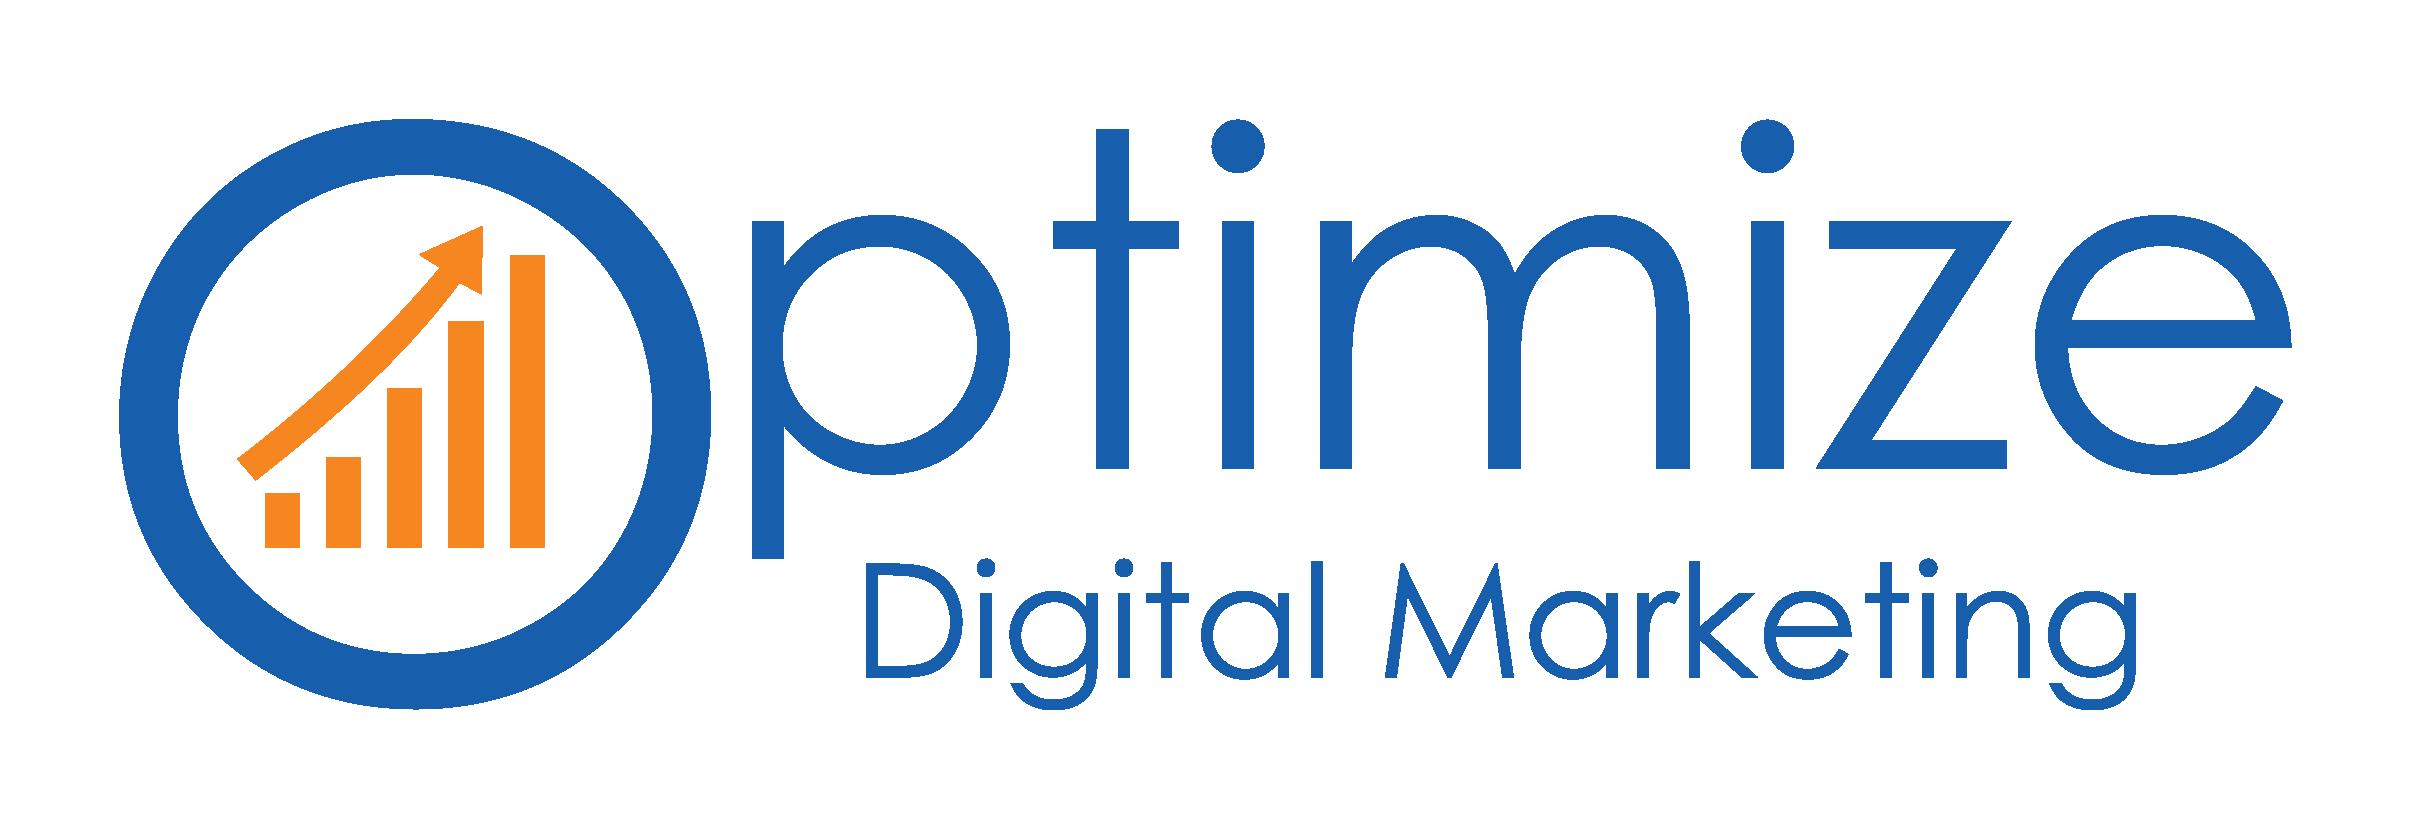 optimizer logo animation loop 210614 230x129 300kb